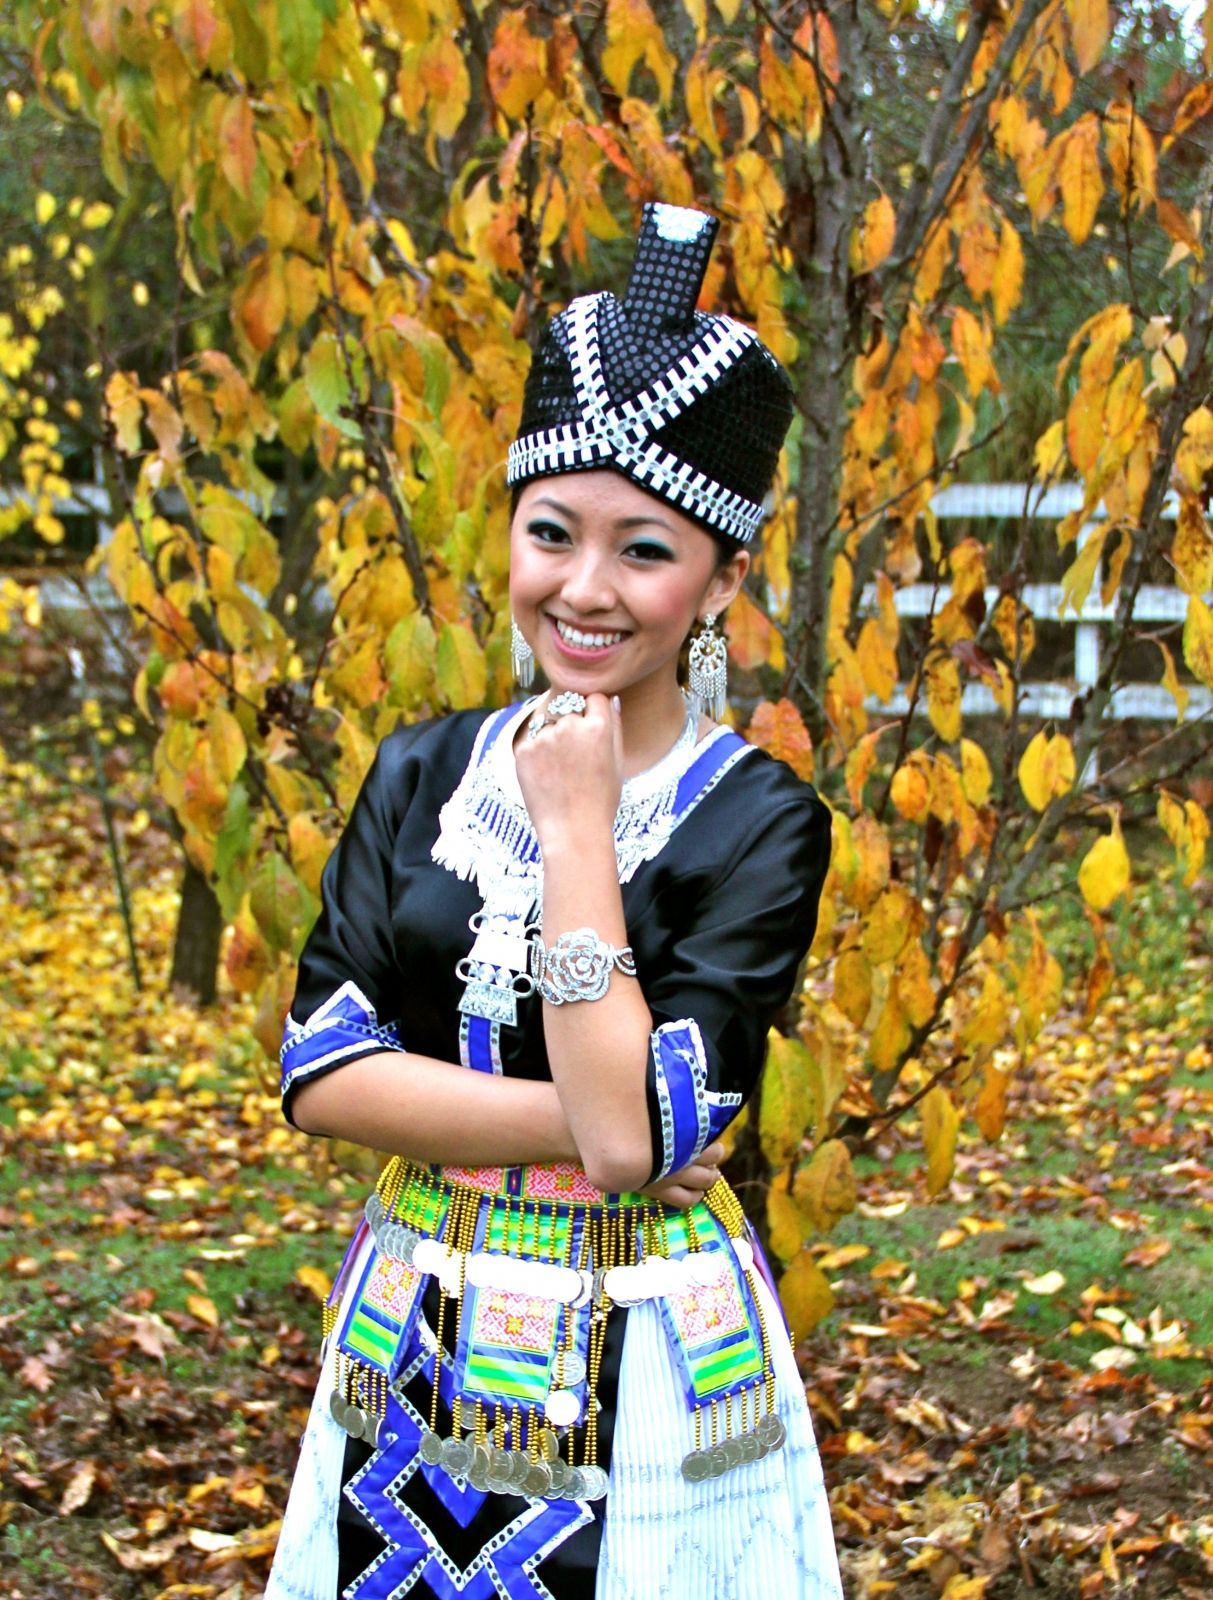 White hmong